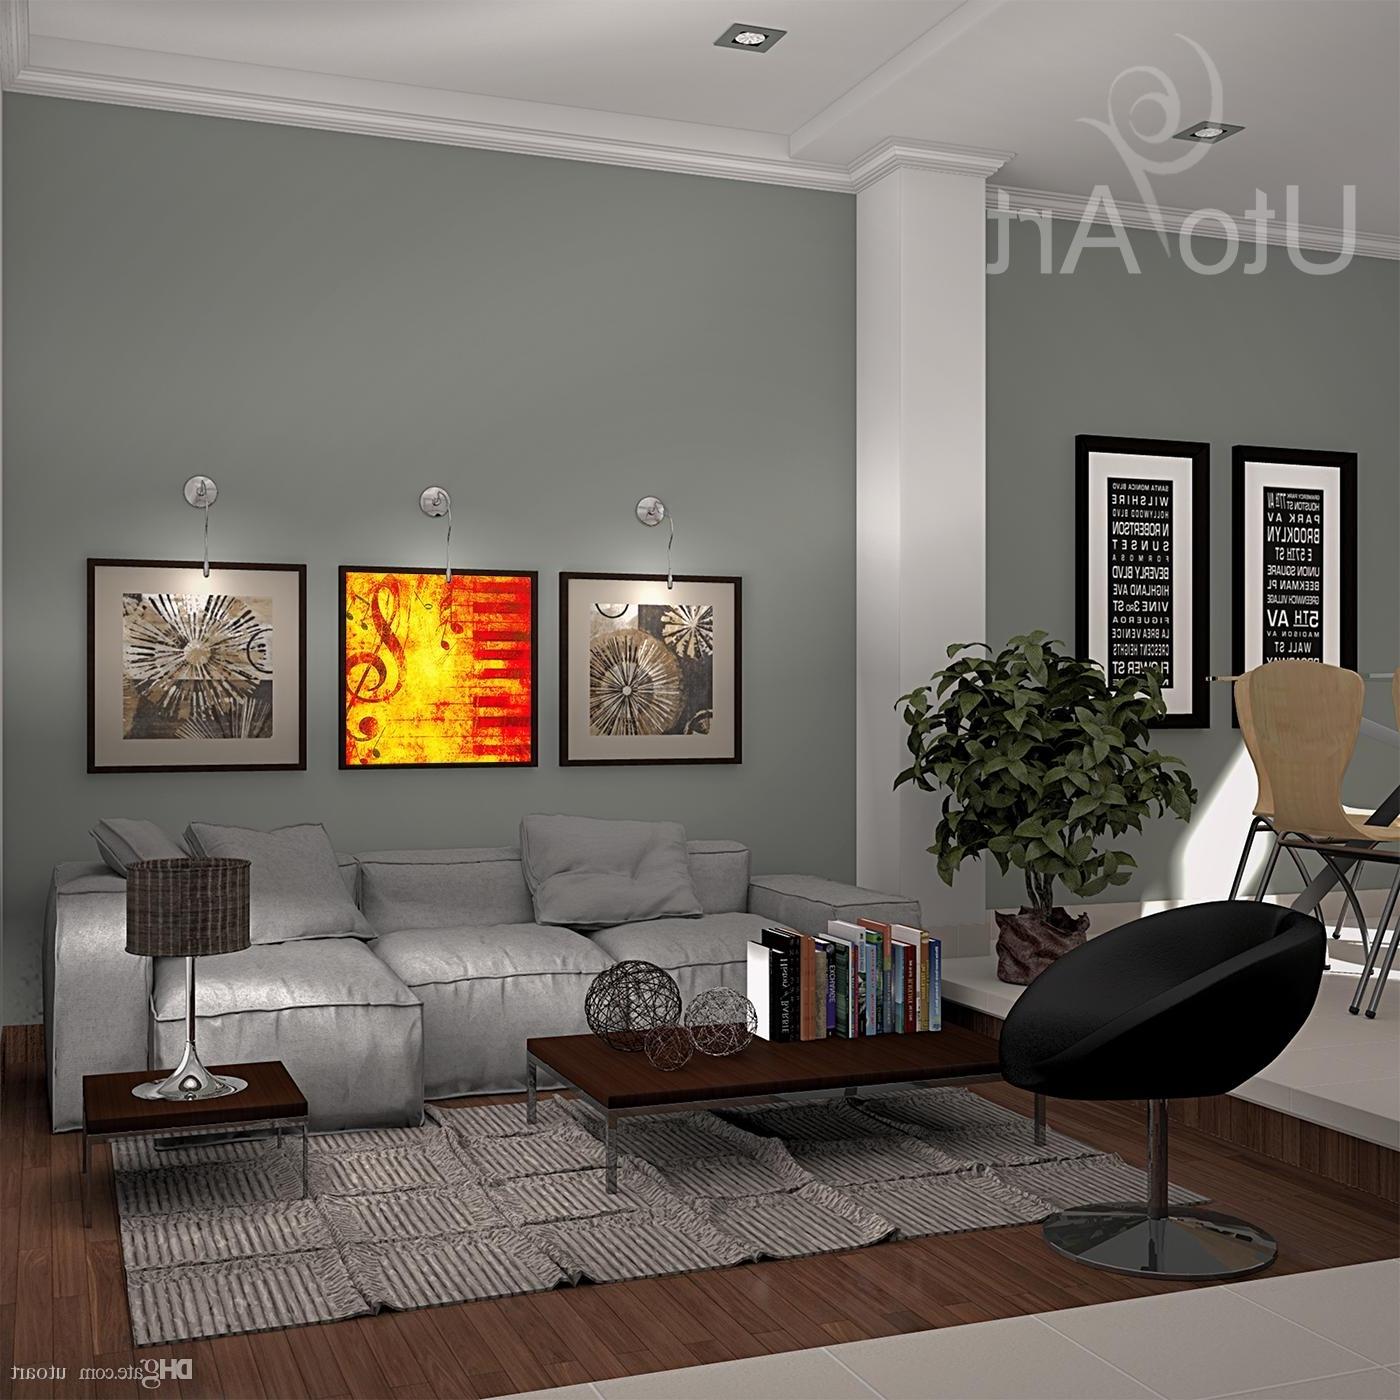 Most Current Decorative Wall Art Regarding Best Modern Home Decorative Canvas Picture Art Print Artwork (View 9 of 15)